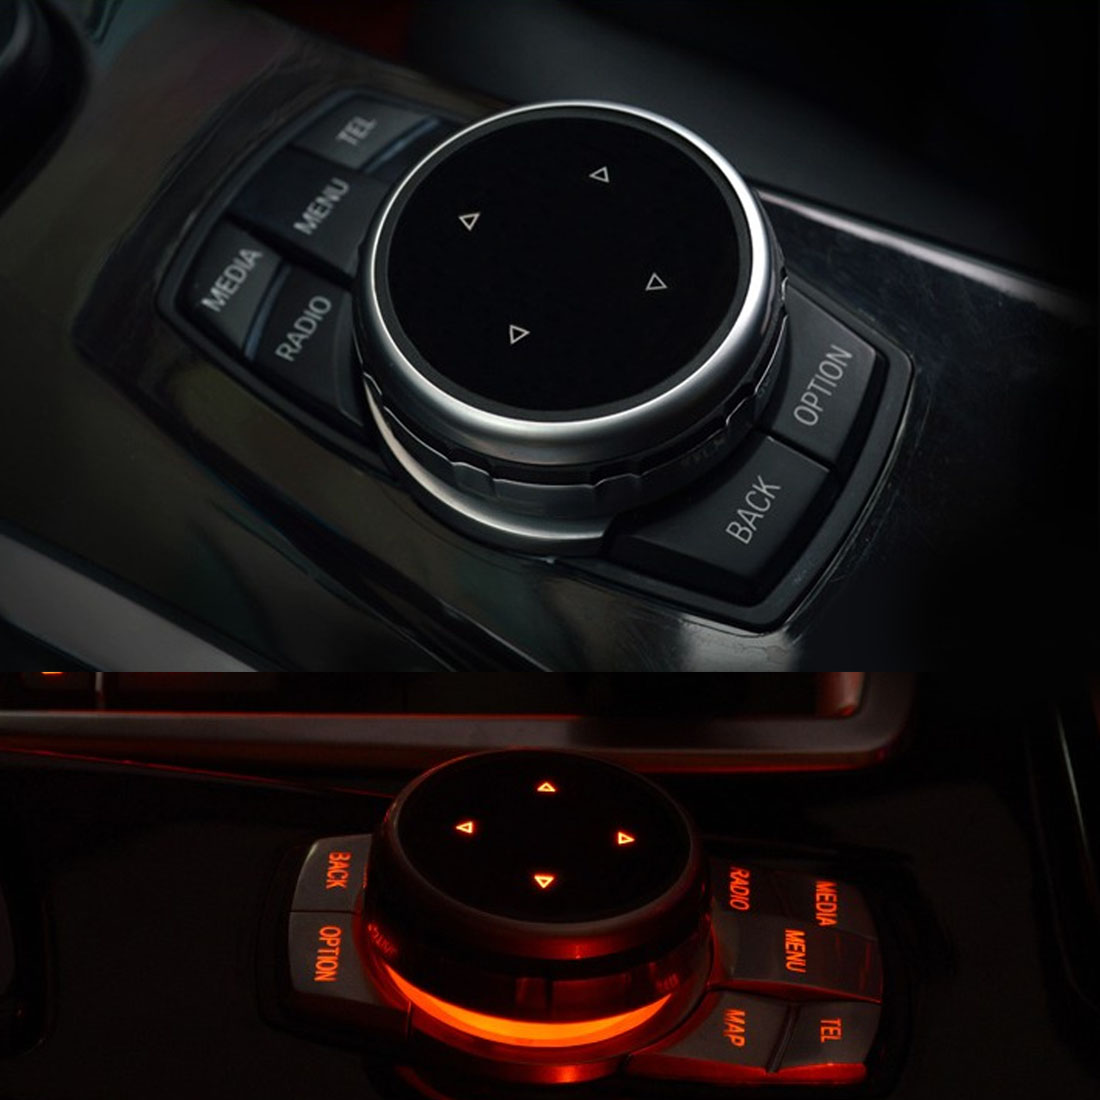 Auto Multimedia Tasten Abdeckung M Emblem Aufkleber für BMW X1 X3 X5 X6 F30 E90 E92 F10 F18 F11 F07 GT Z4 F15 F16 F25 E60 E61